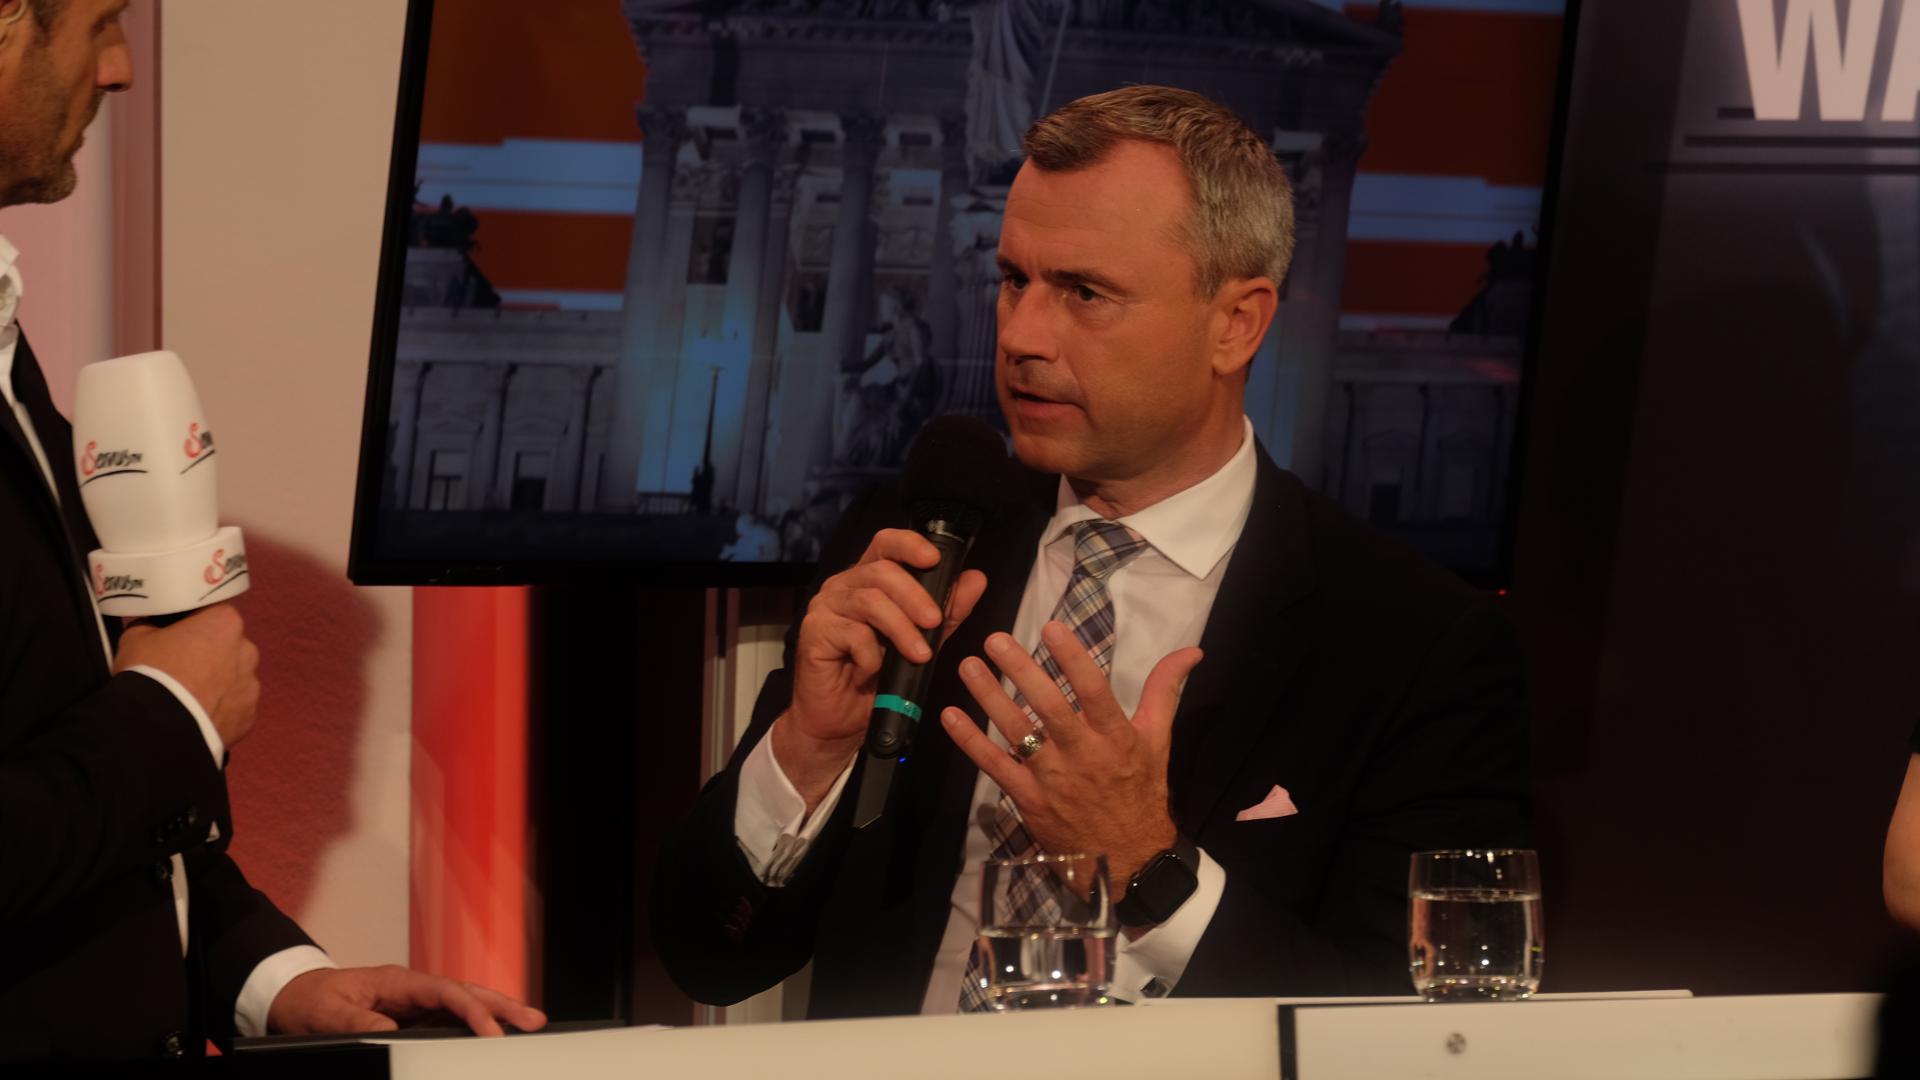 Norbert Hofer-Nationalratswahl-Servus TV-Fleischhacker-2019-Politik-Sebastian Kurz